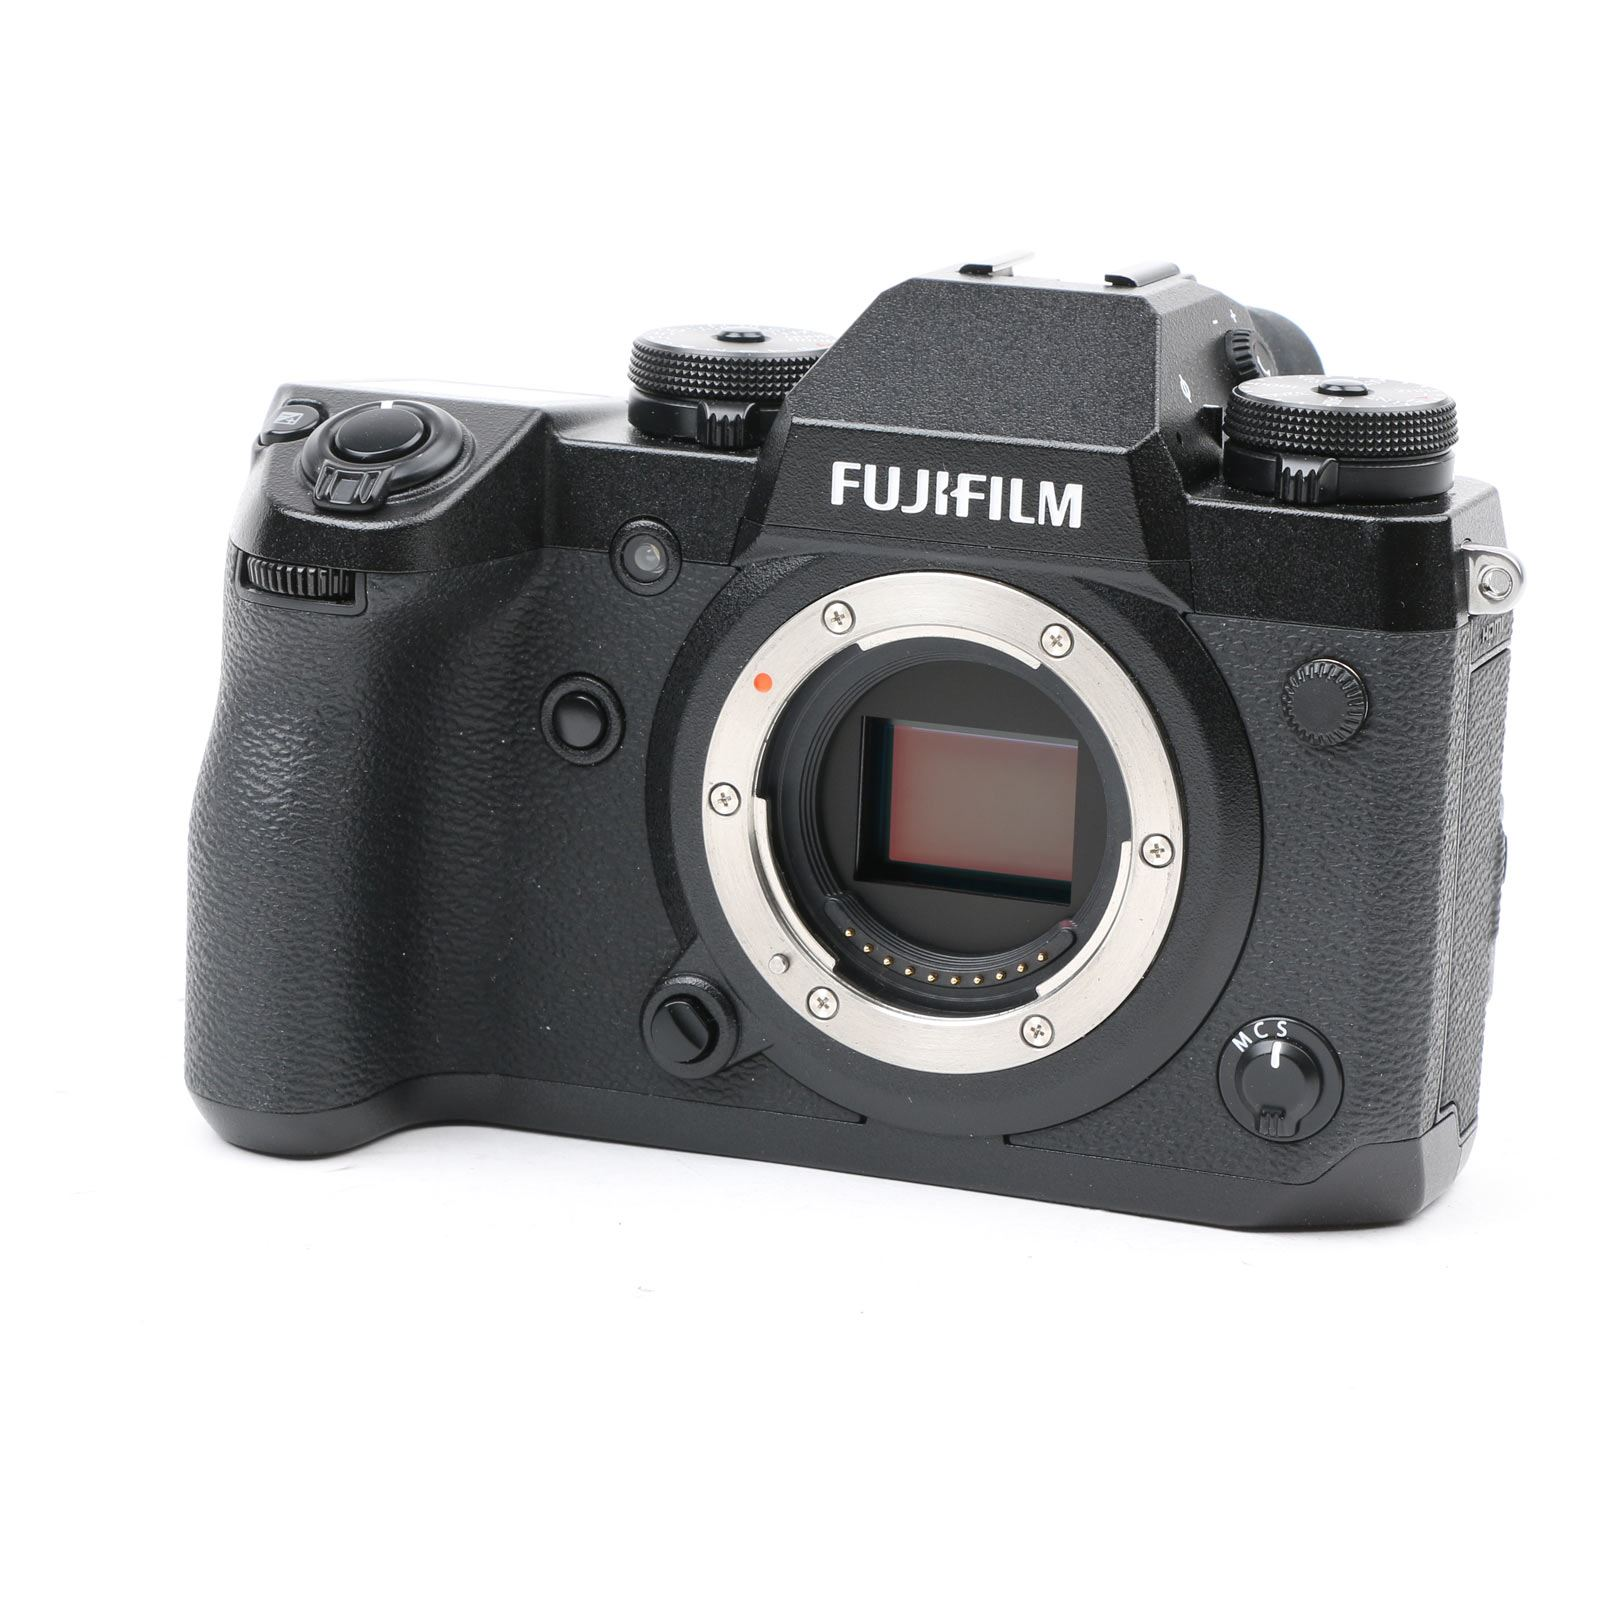 Image of Used Fujifilm X-H1 Digital Camera Body